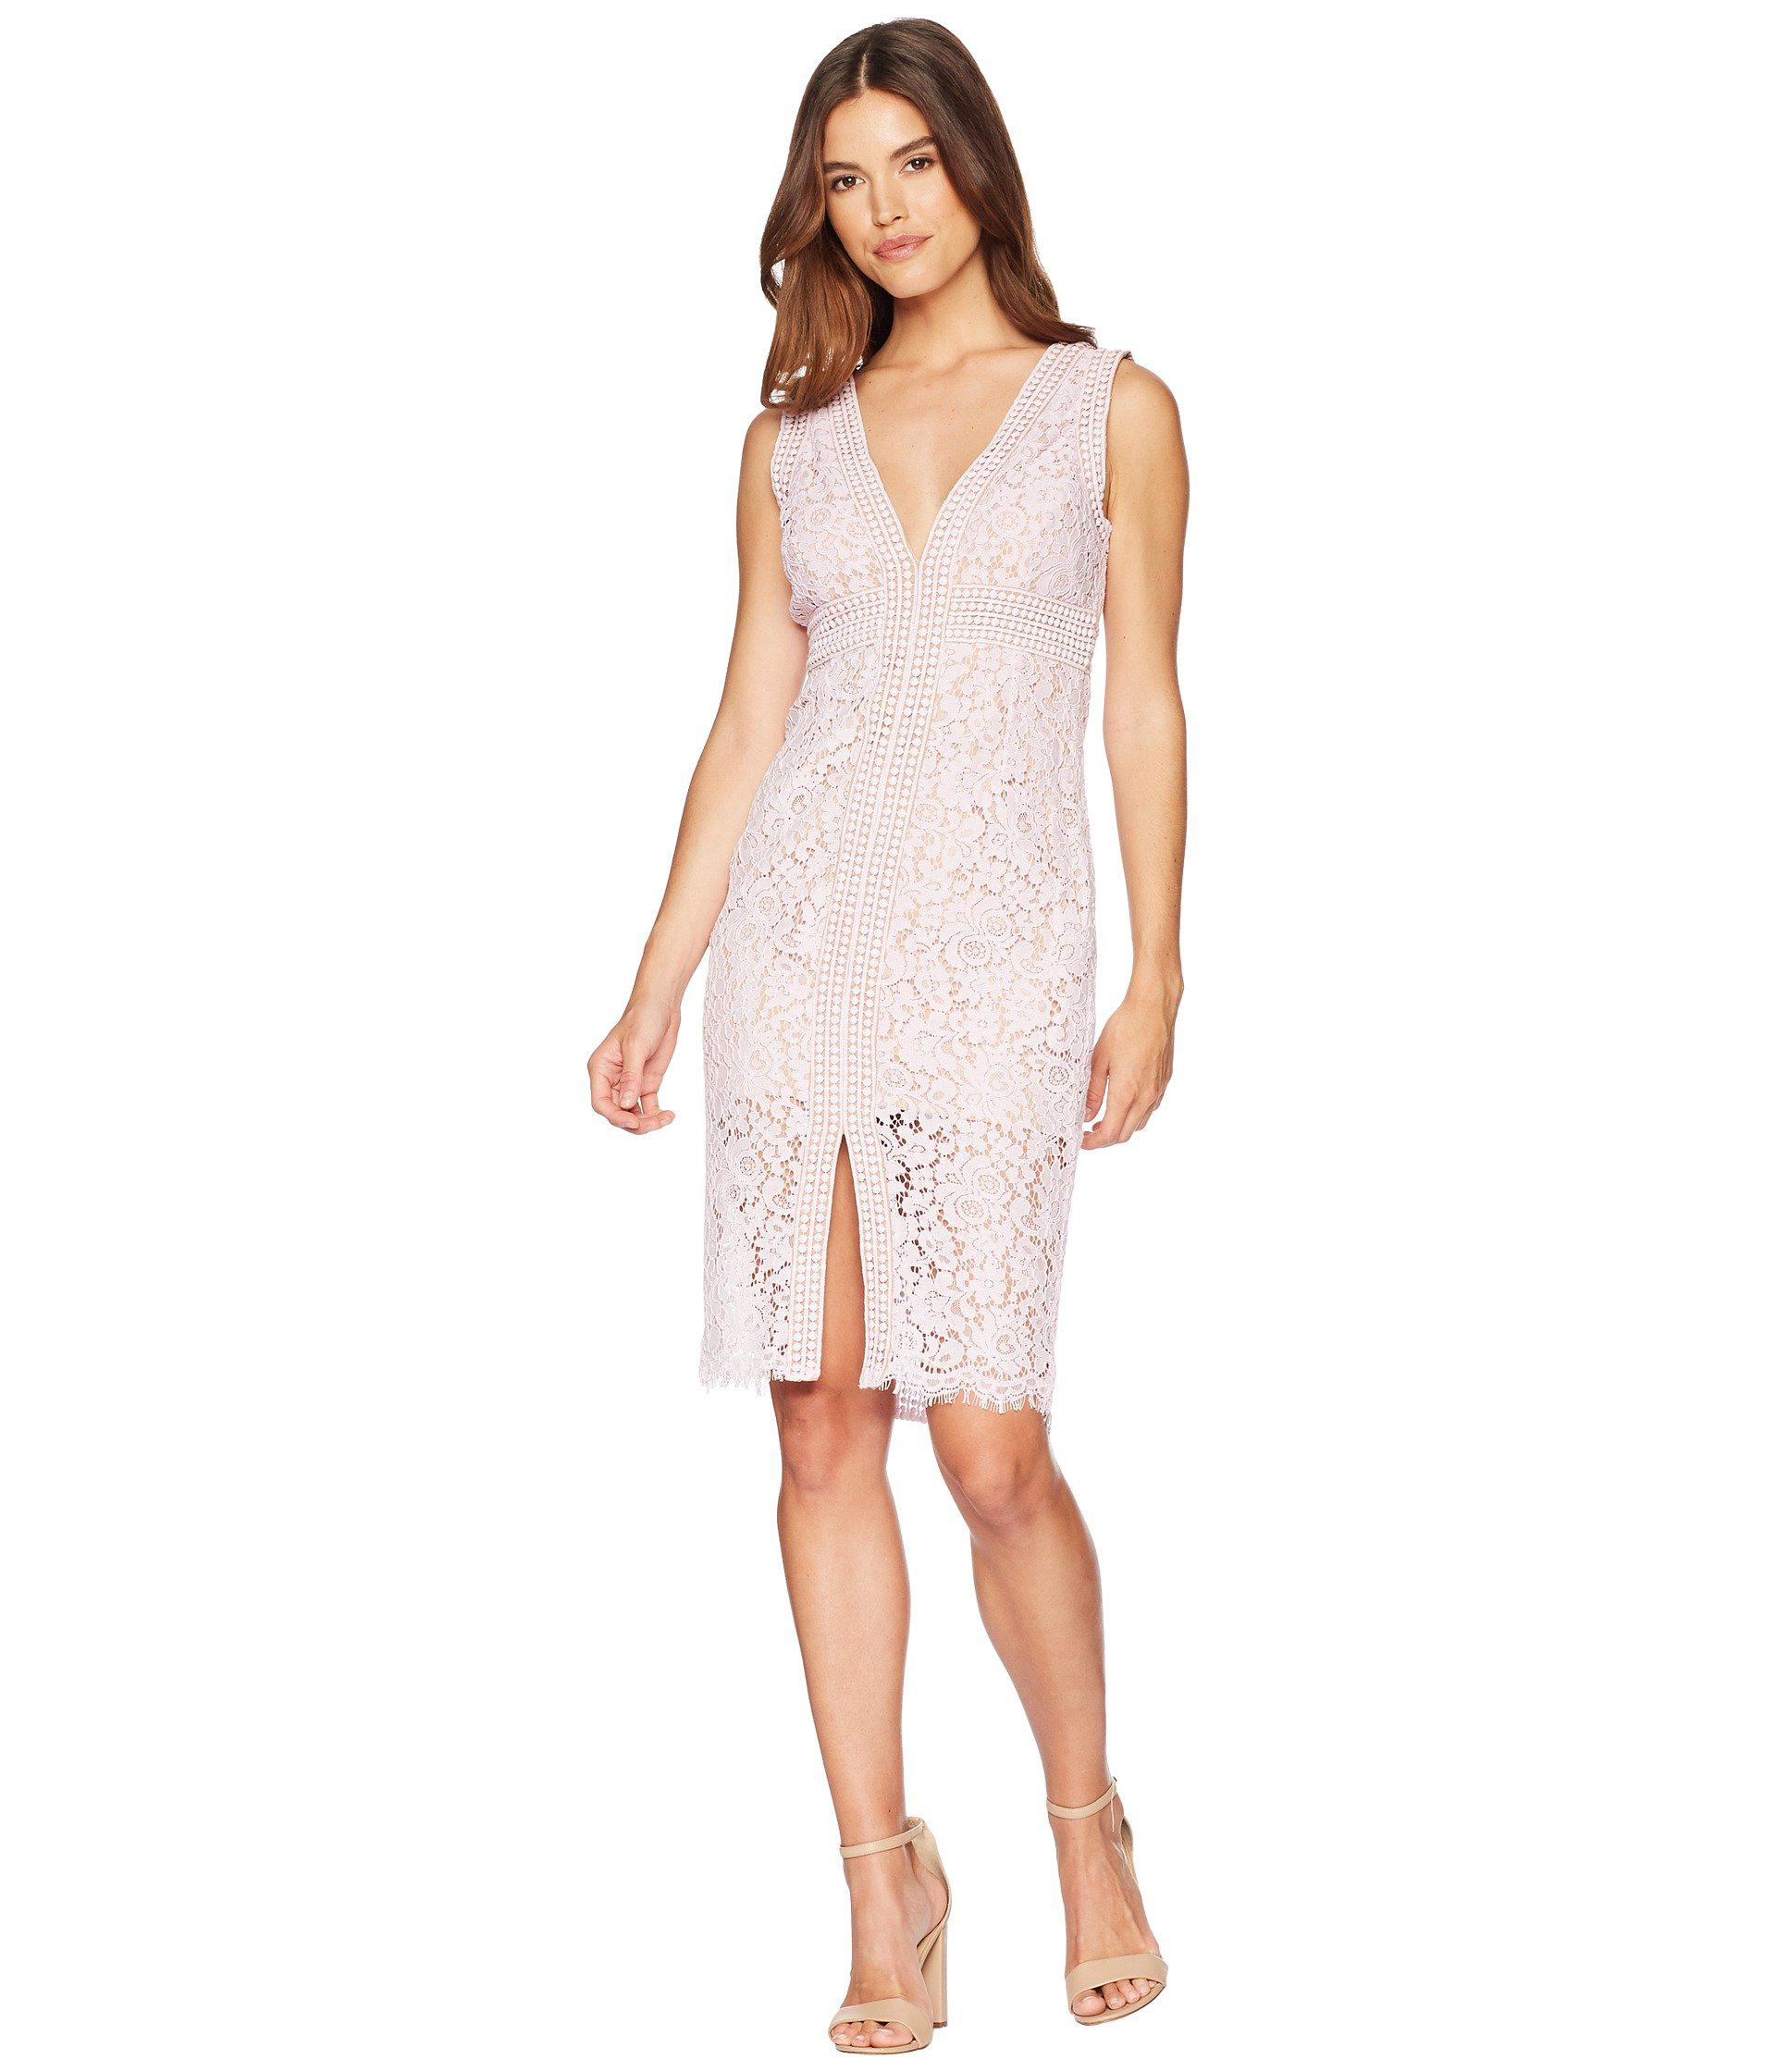 Lyst - Bardot Morgan Lace Dress - Save 14% af2eaf10c